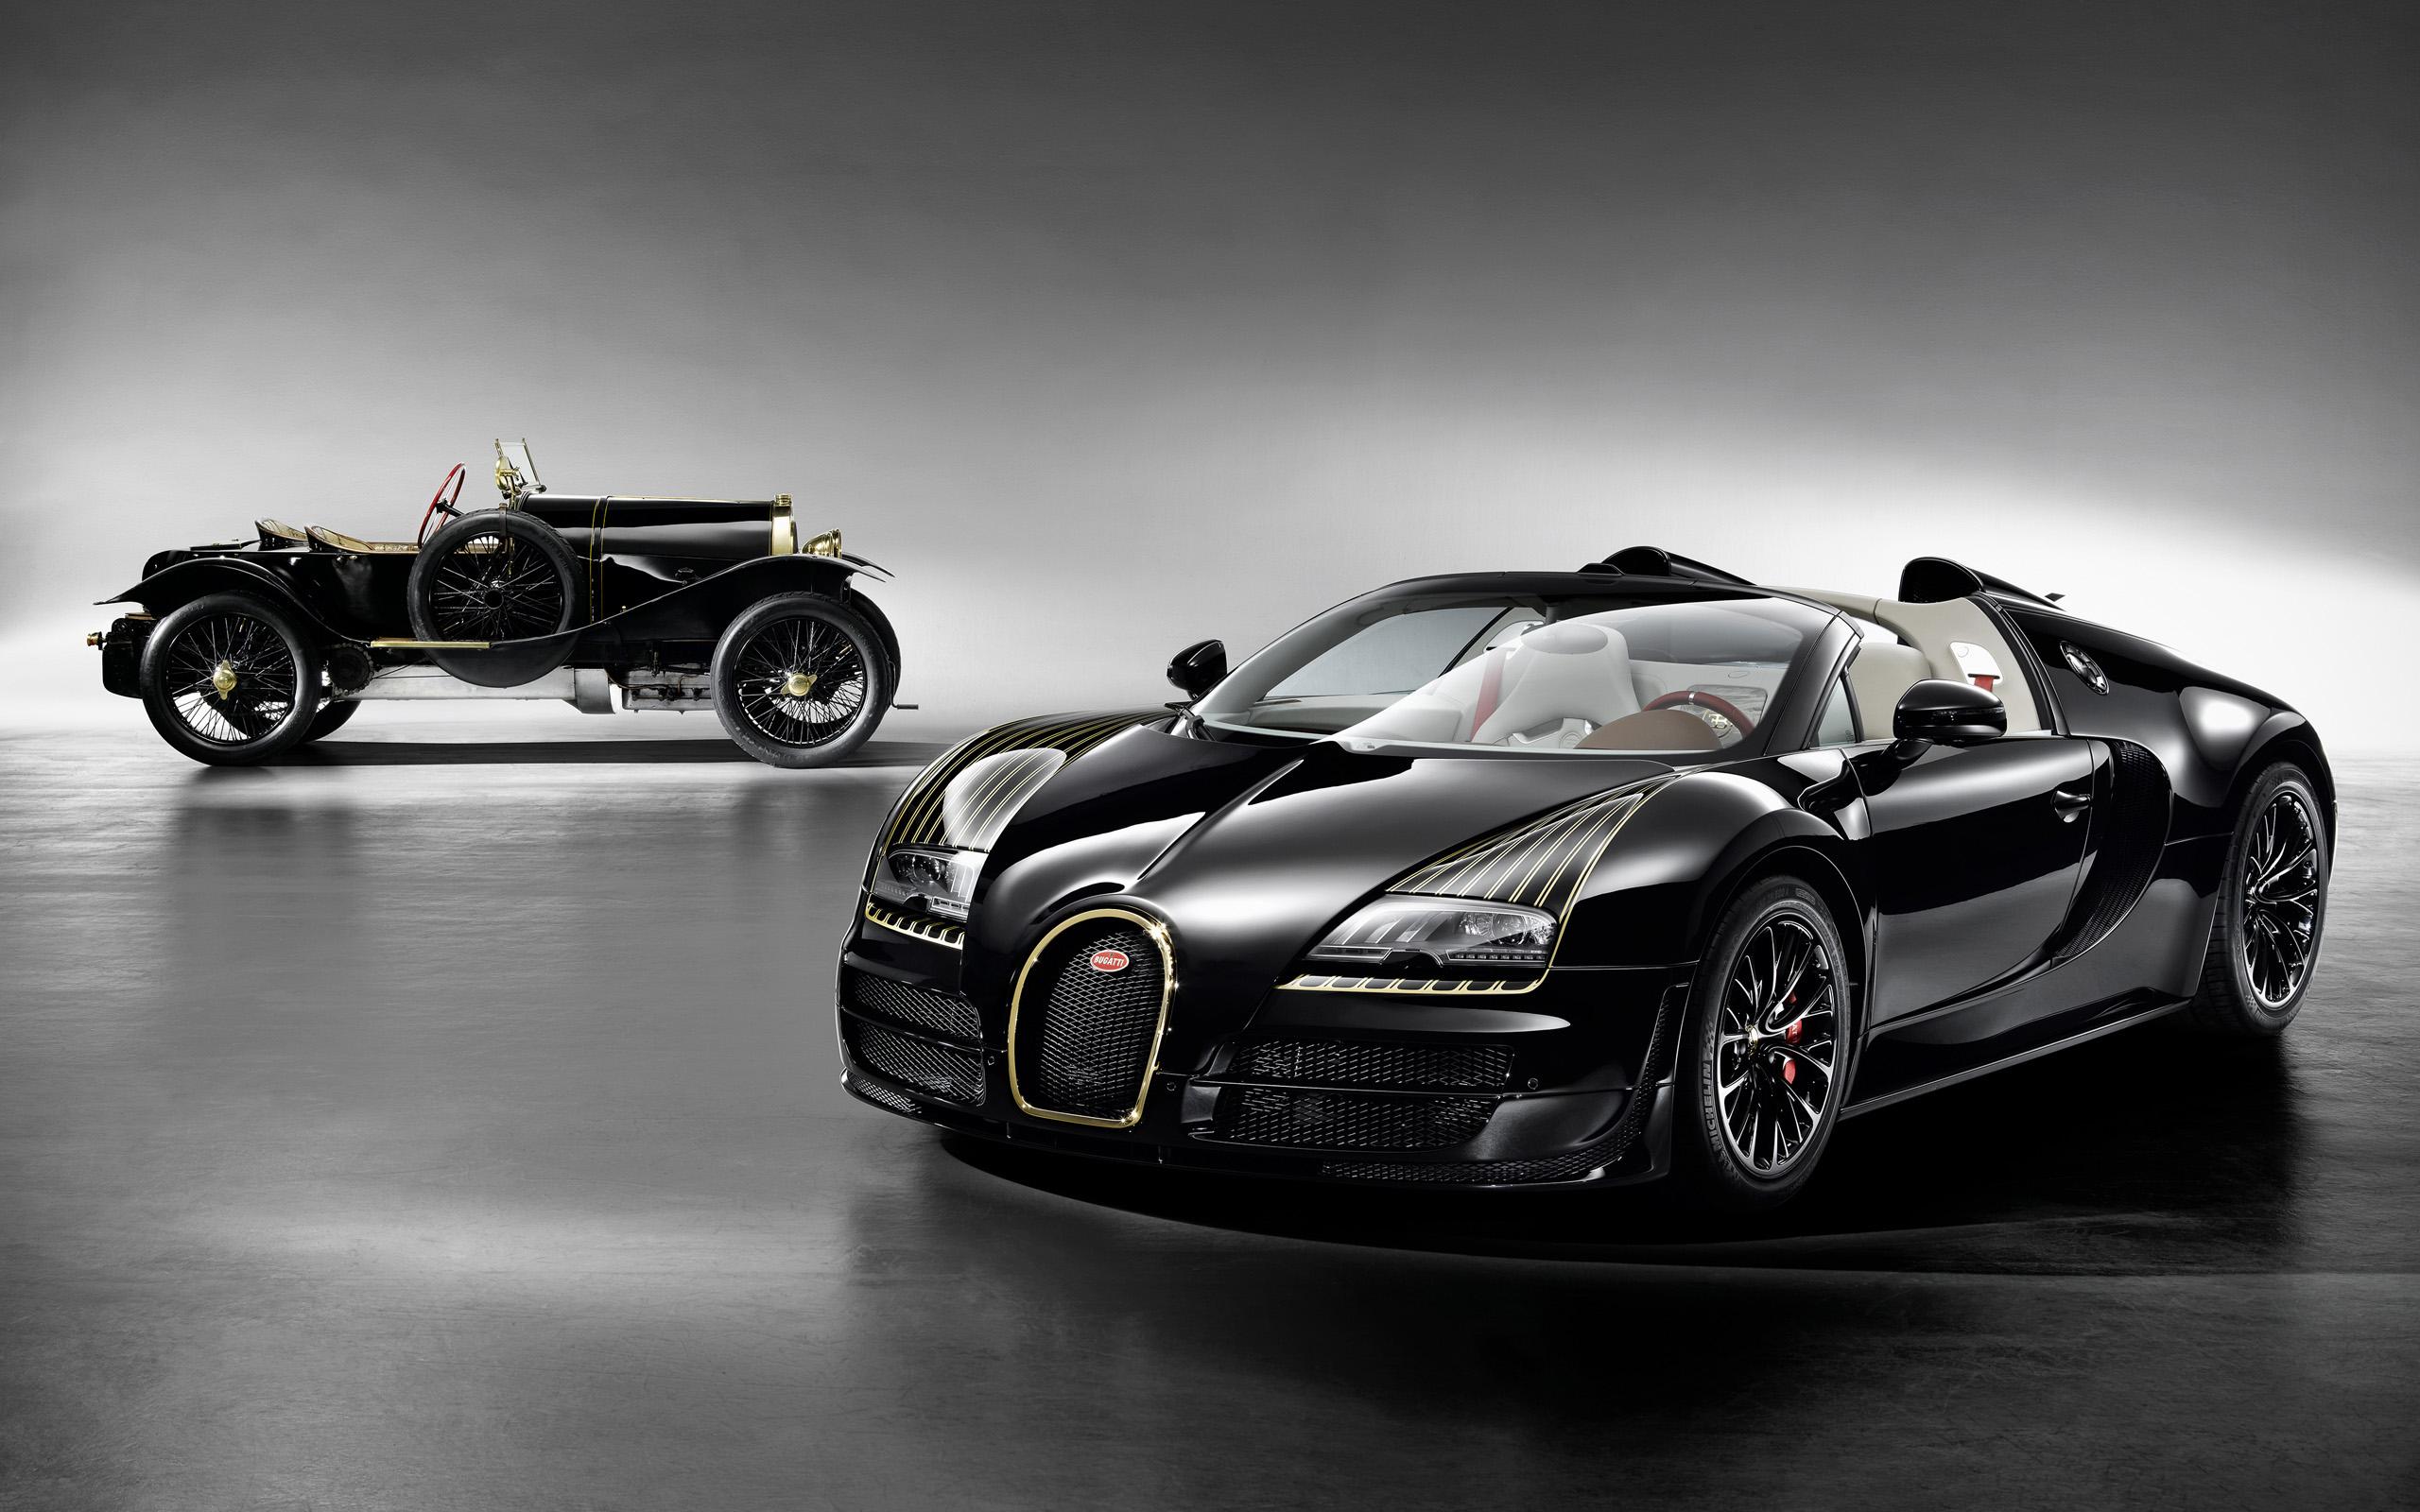 2014 bugatti veyron grand sport vitesse legend black bess 5 wallpaper hd car wallpapers id 4408. Black Bedroom Furniture Sets. Home Design Ideas